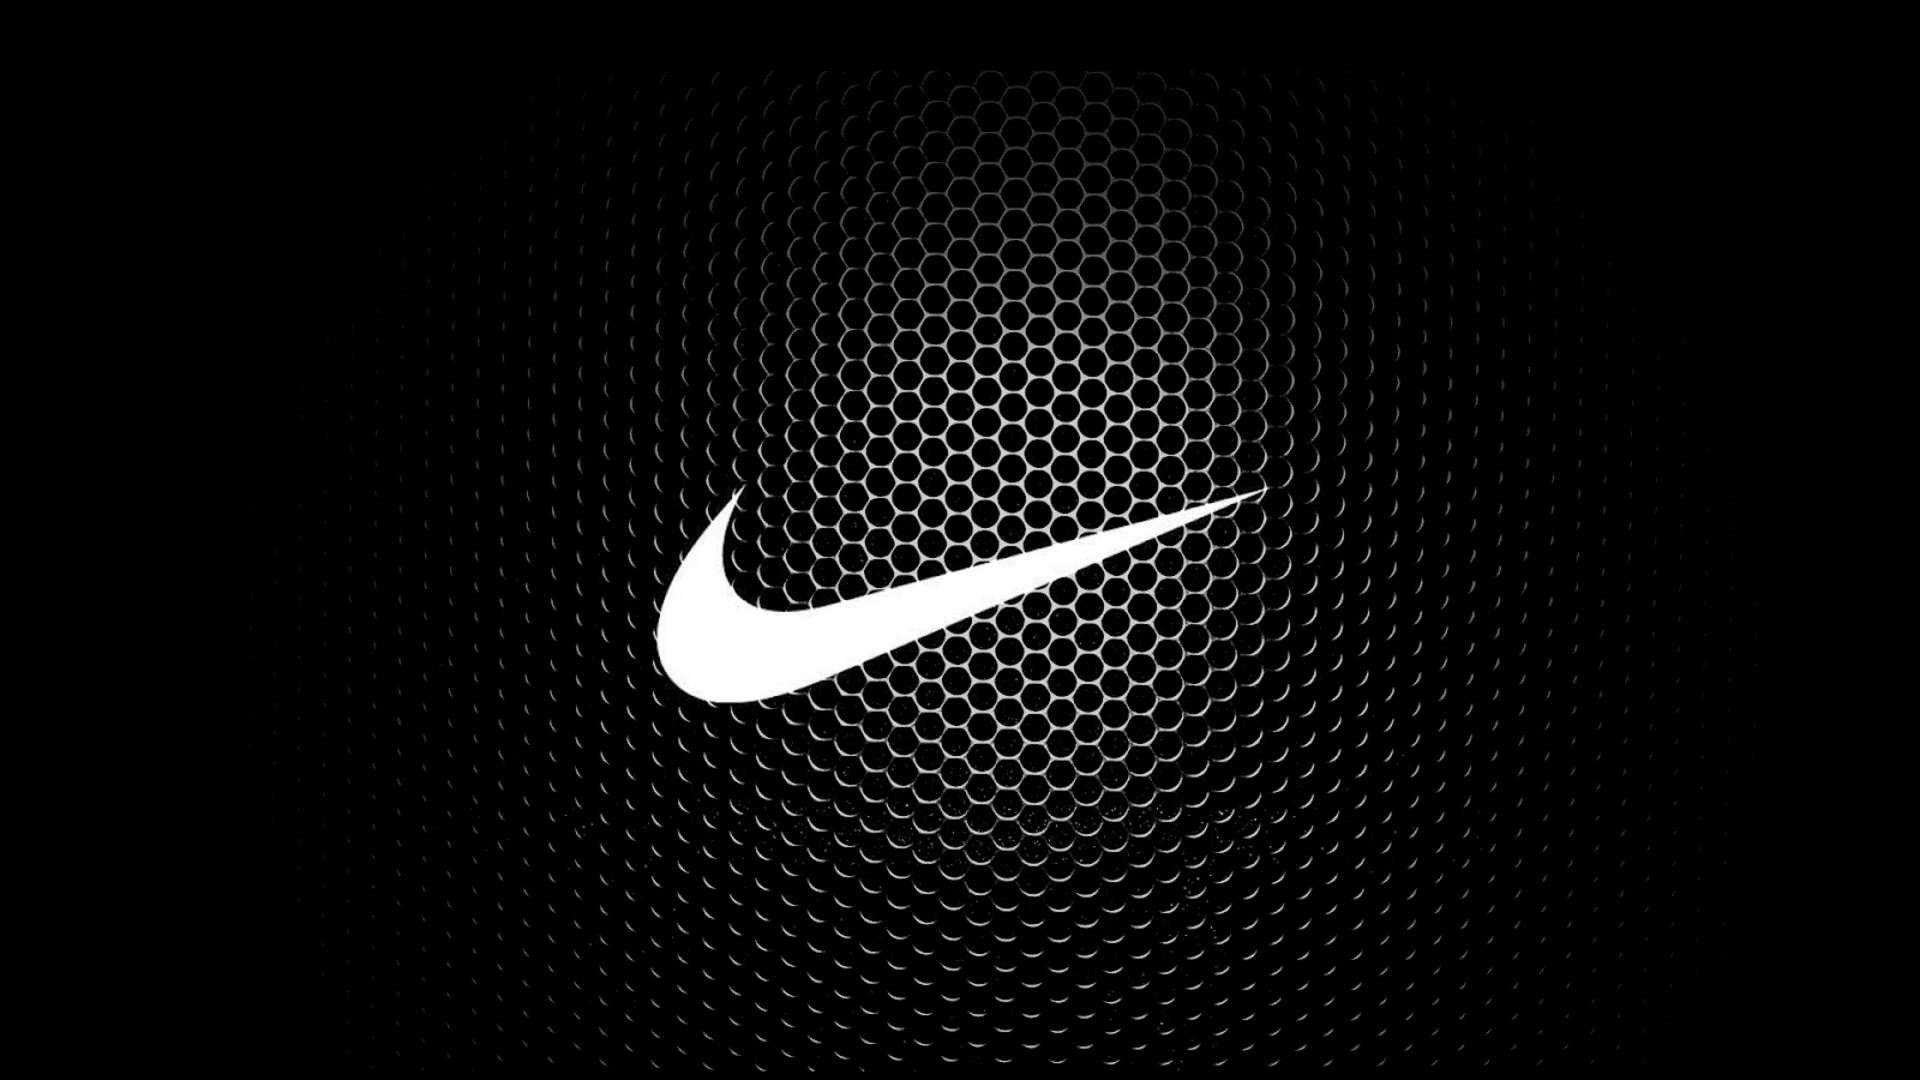 1920x1080 NikeBlackPhoto Nike logo wallpapers, Nike